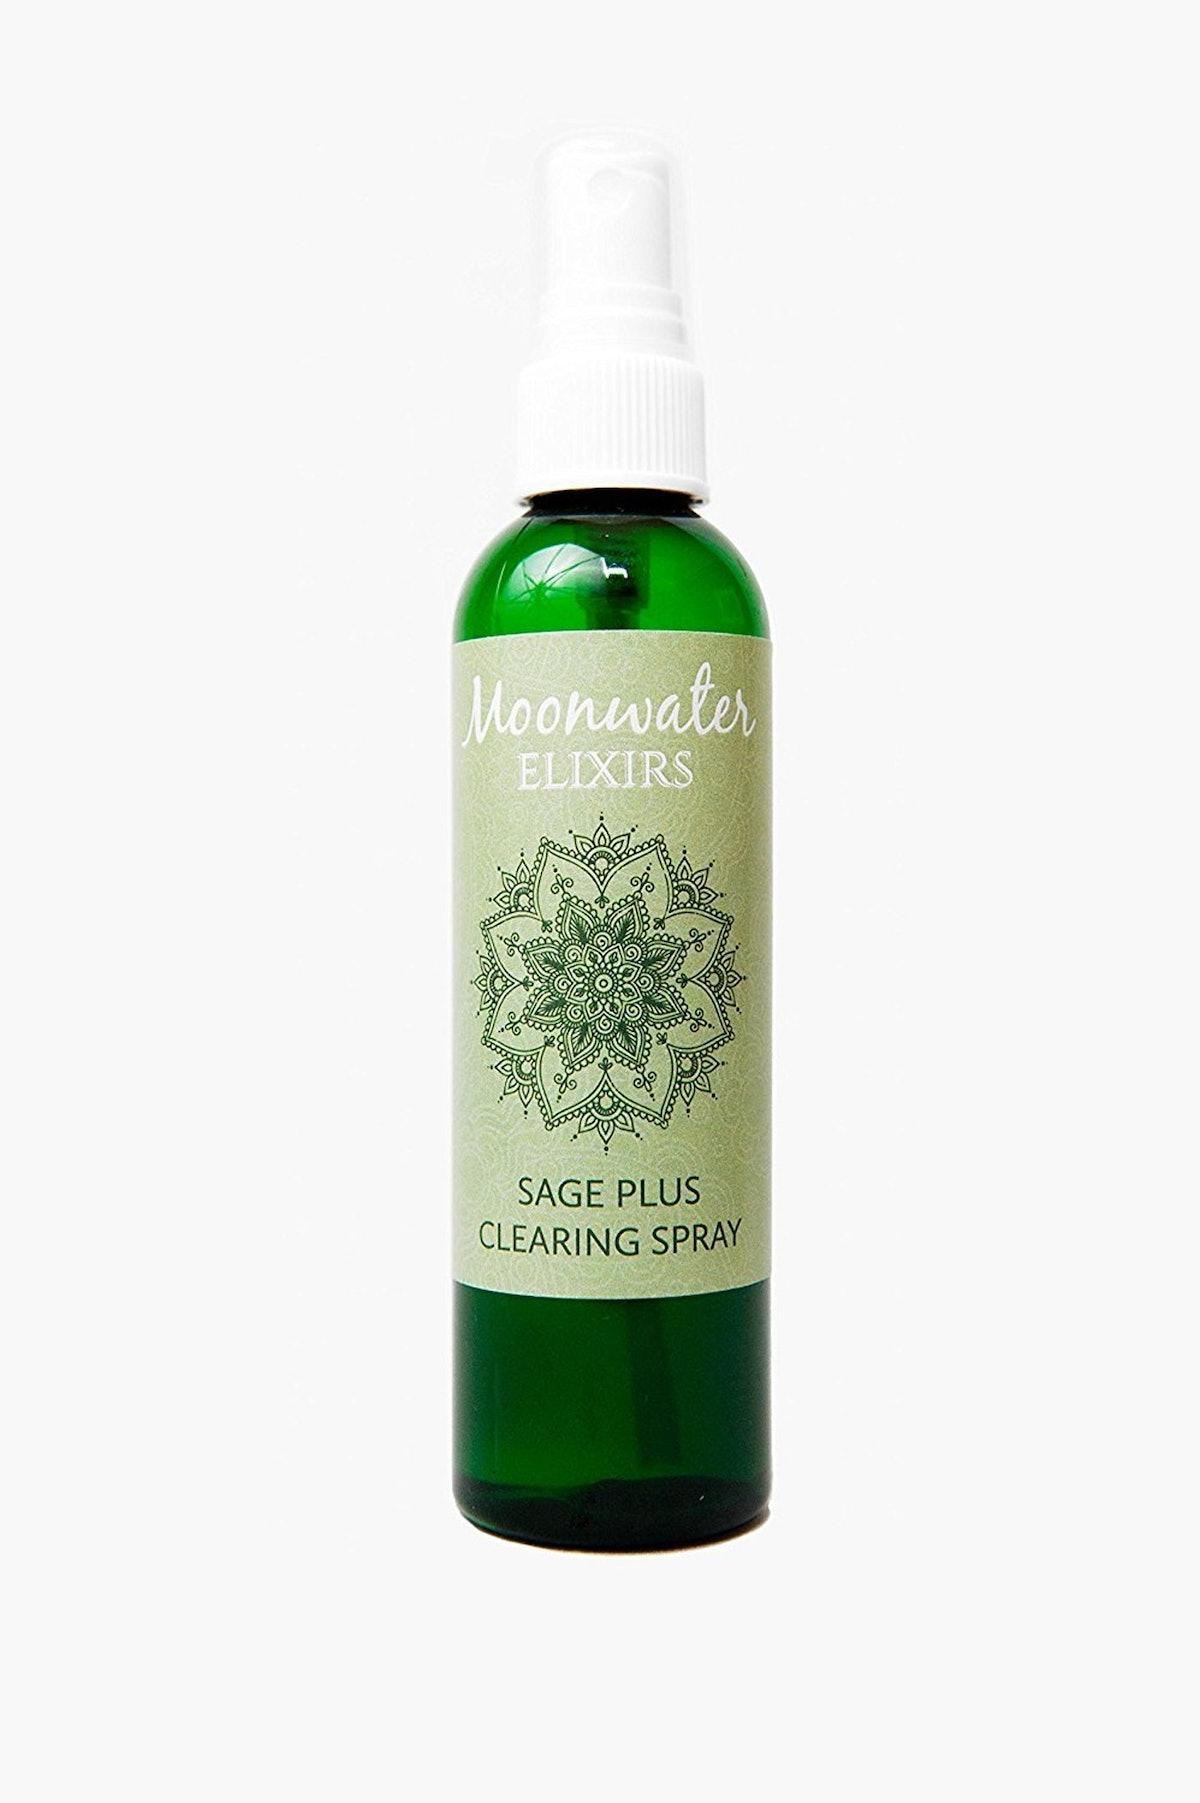 Moonwater Elixirs White Sage Spray